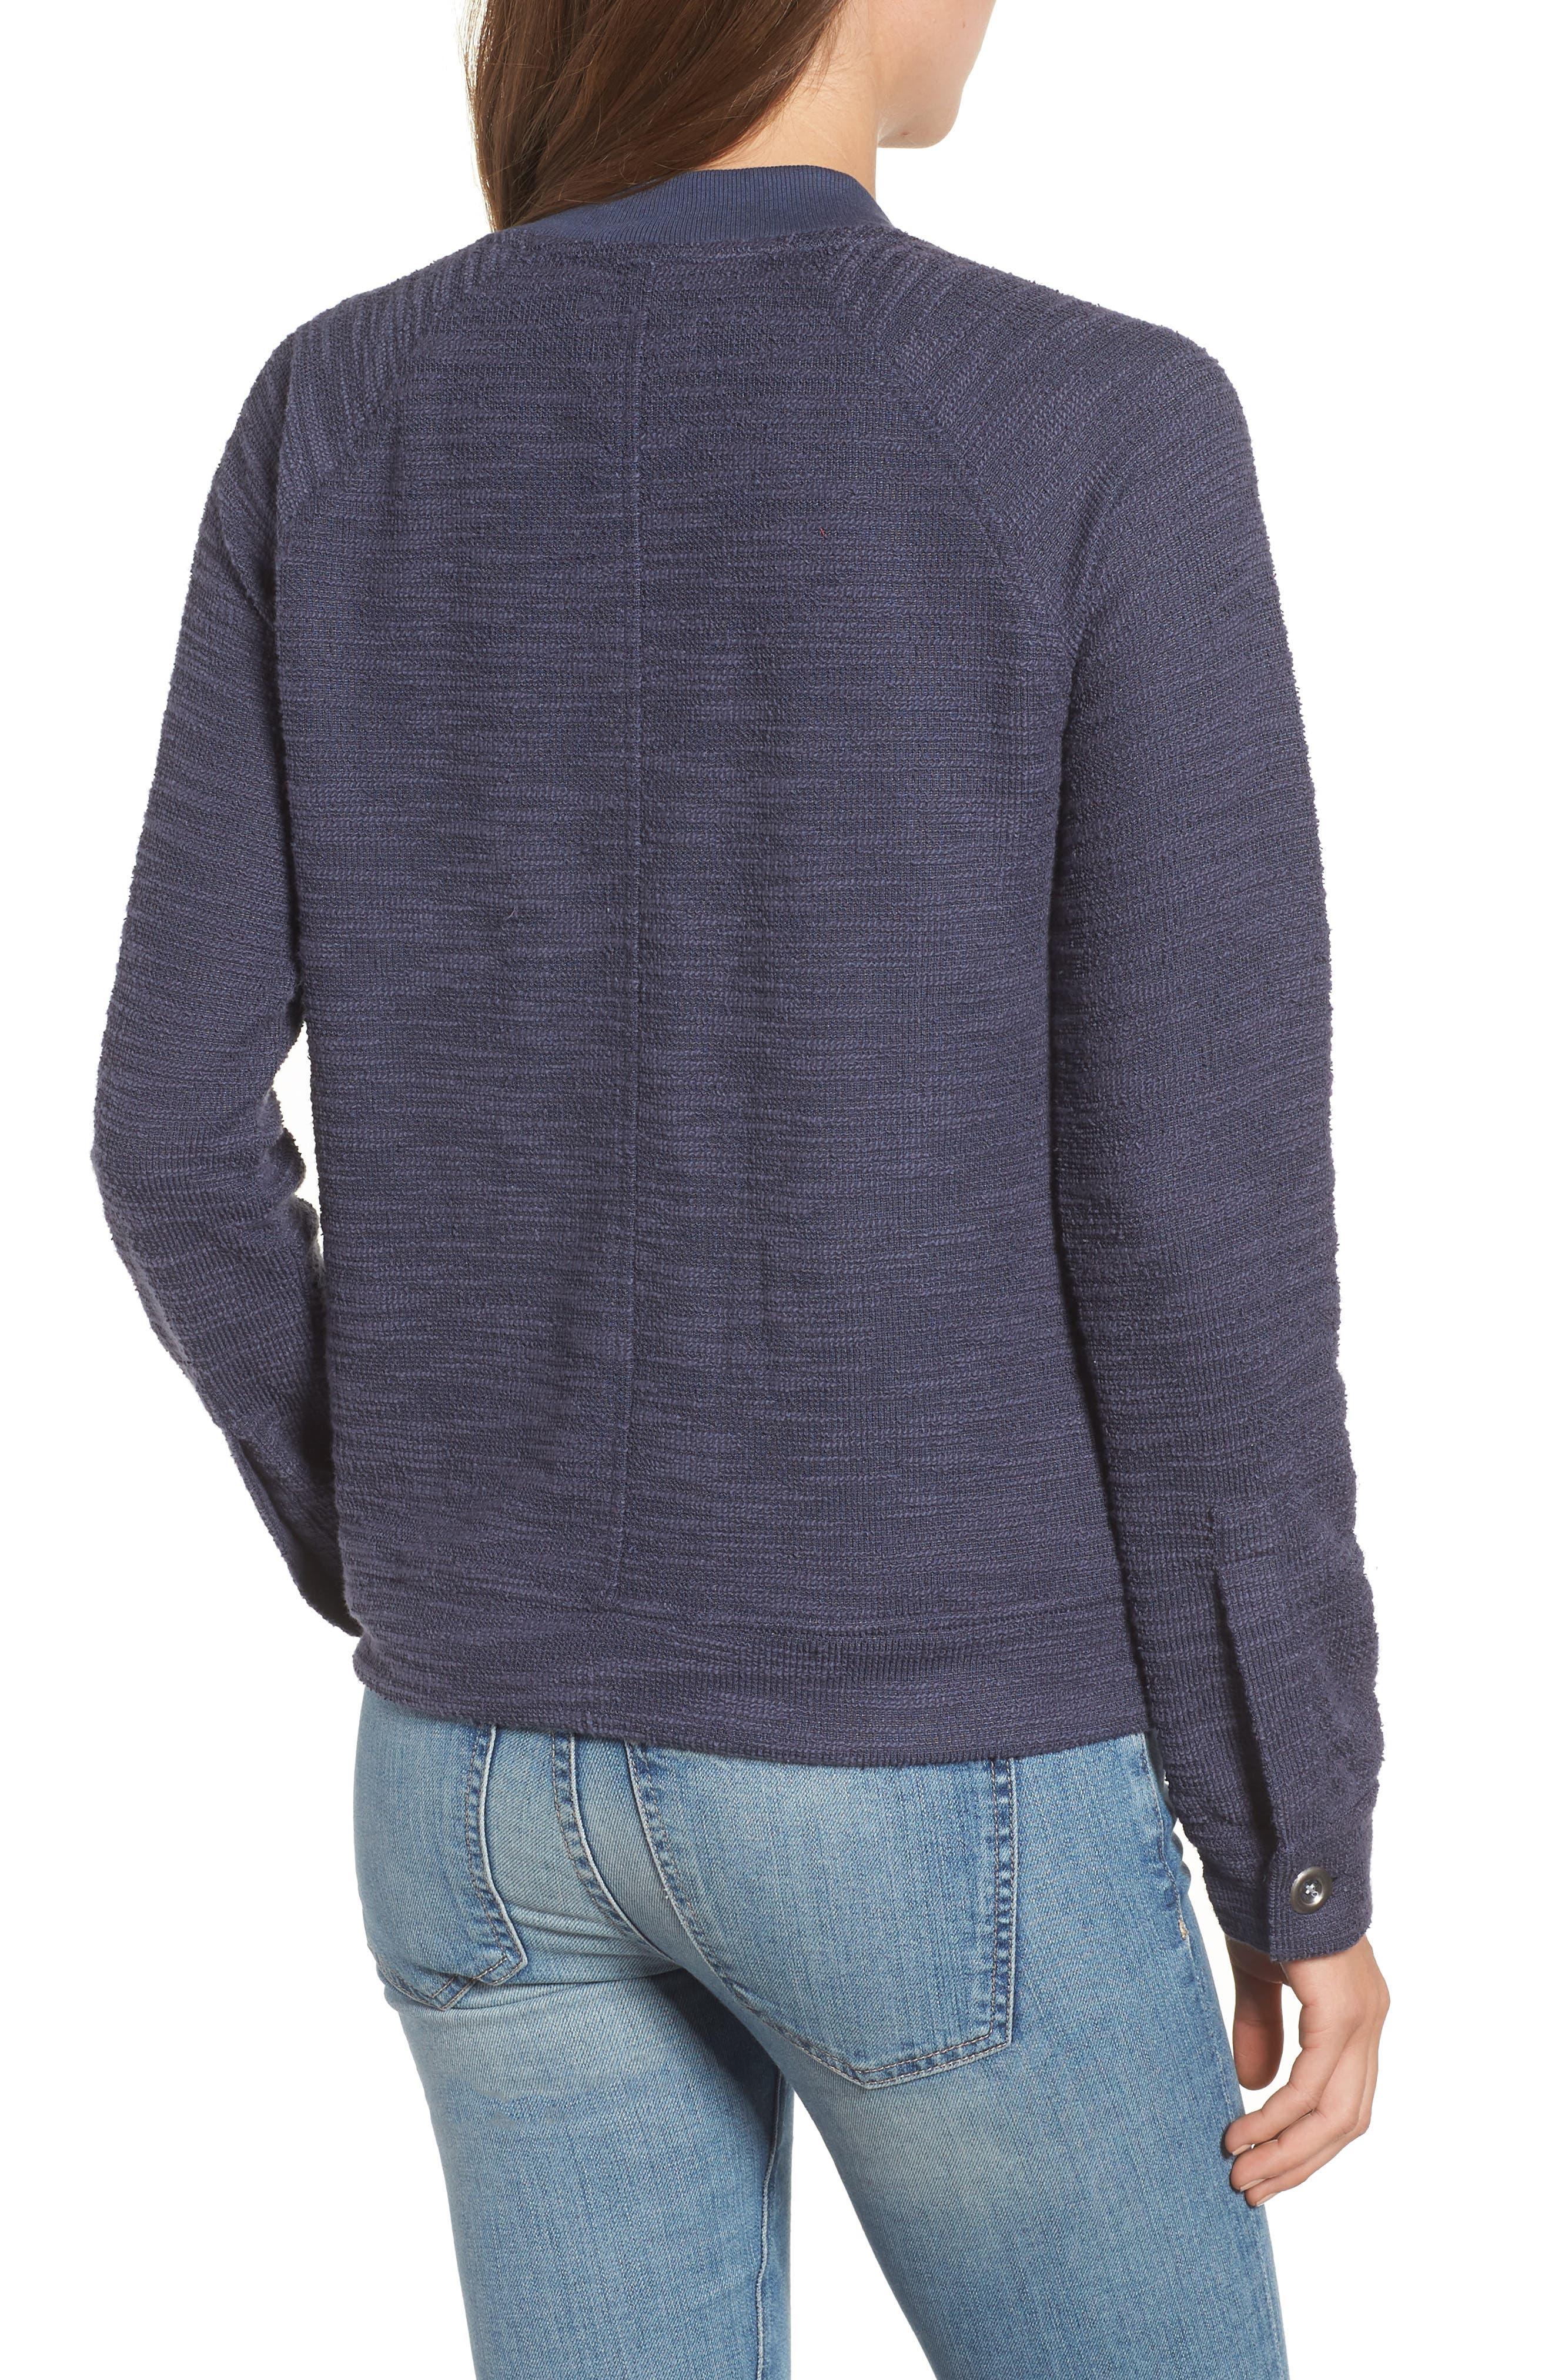 Knit Bomber Jacket,                             Alternate thumbnail 2, color,                             Navy Indigo